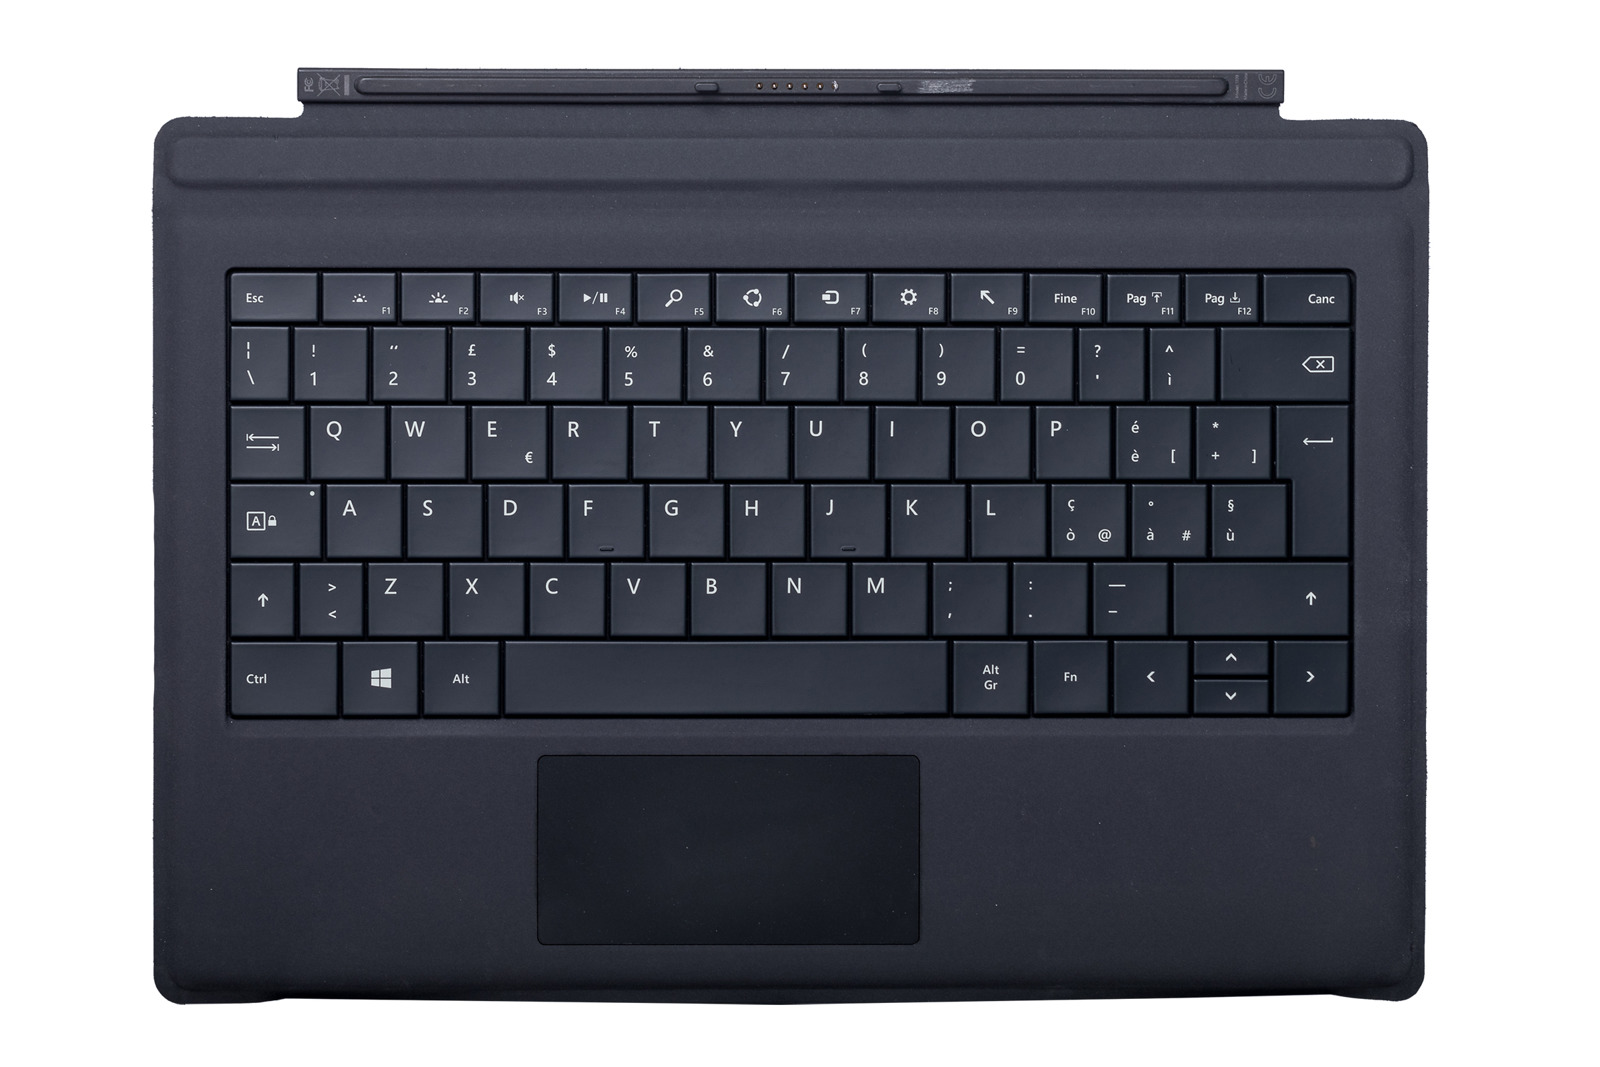 Keyboard Microsoft Surface Type Cover Pro 3 Black QWERTY (Italian) Grade B